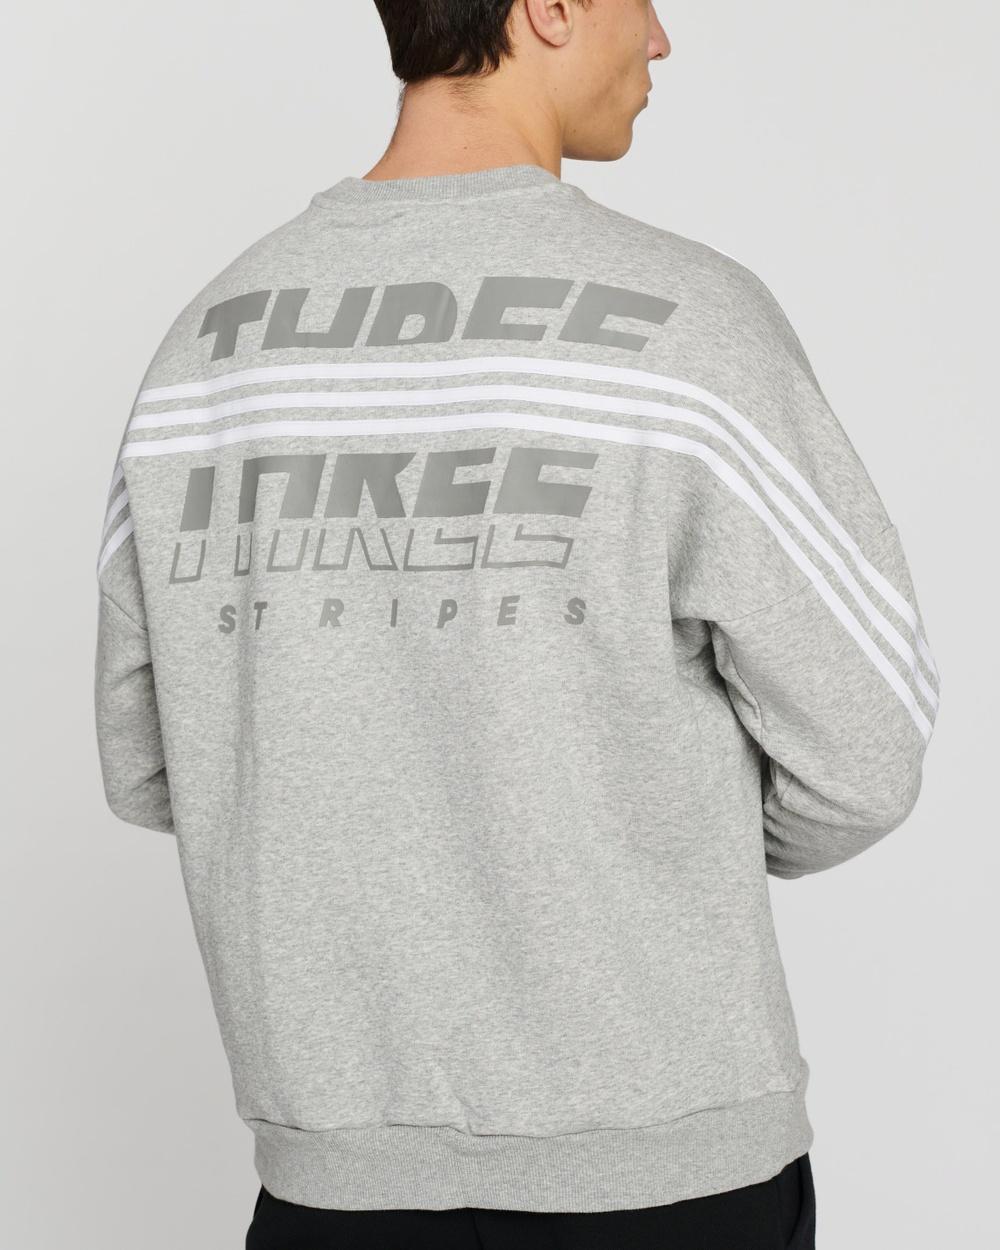 adidas Performance Sportswear Sweatshirt Crew Necks Medium Grey Heather